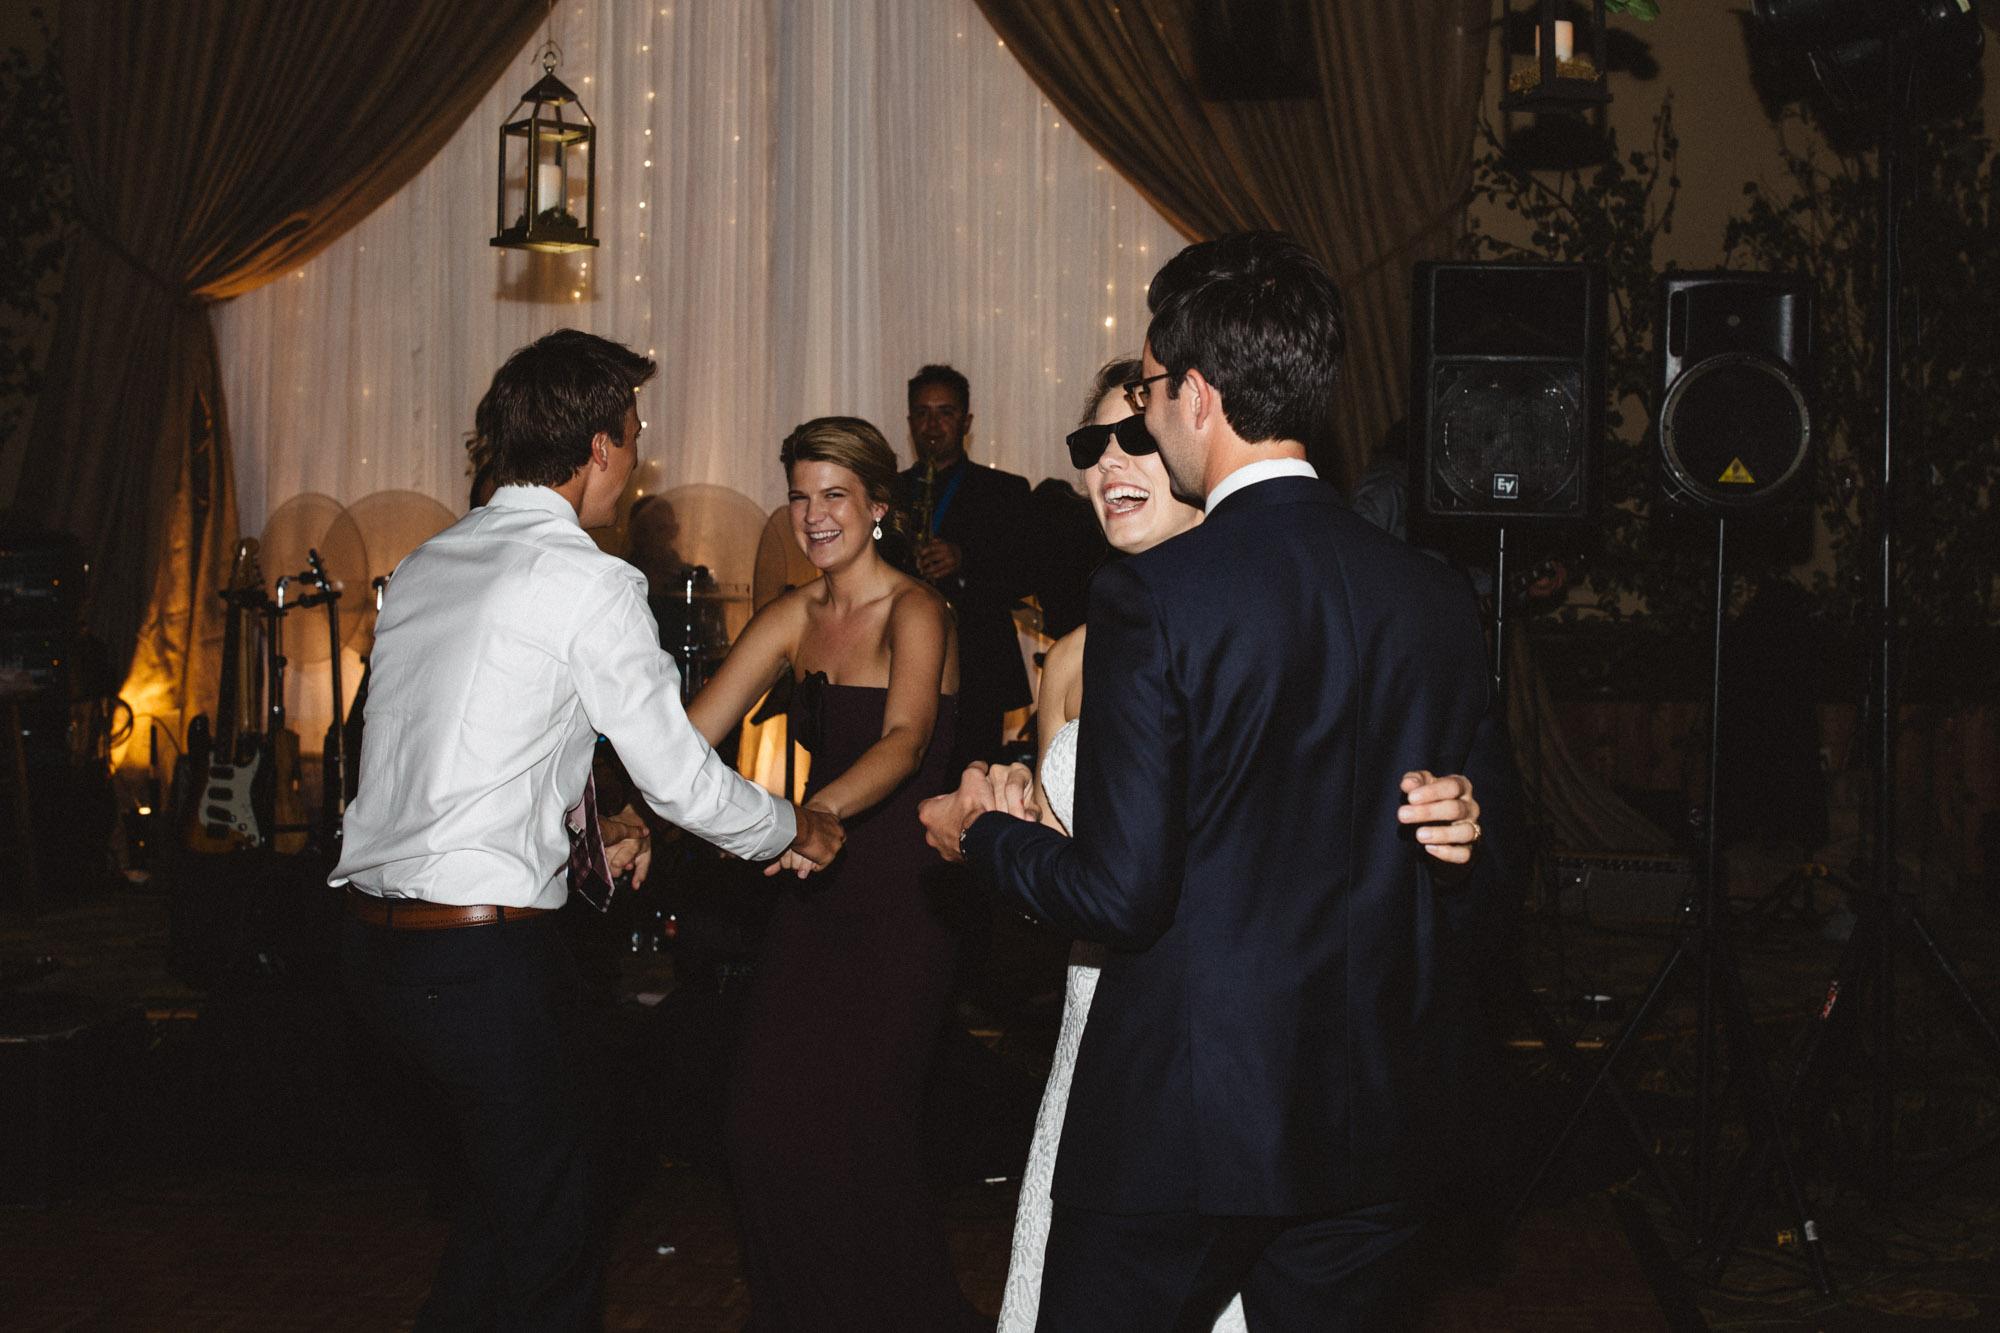 Unposed dance photos at Grand View Lodge wedding, photography by Britt DeZeeuw